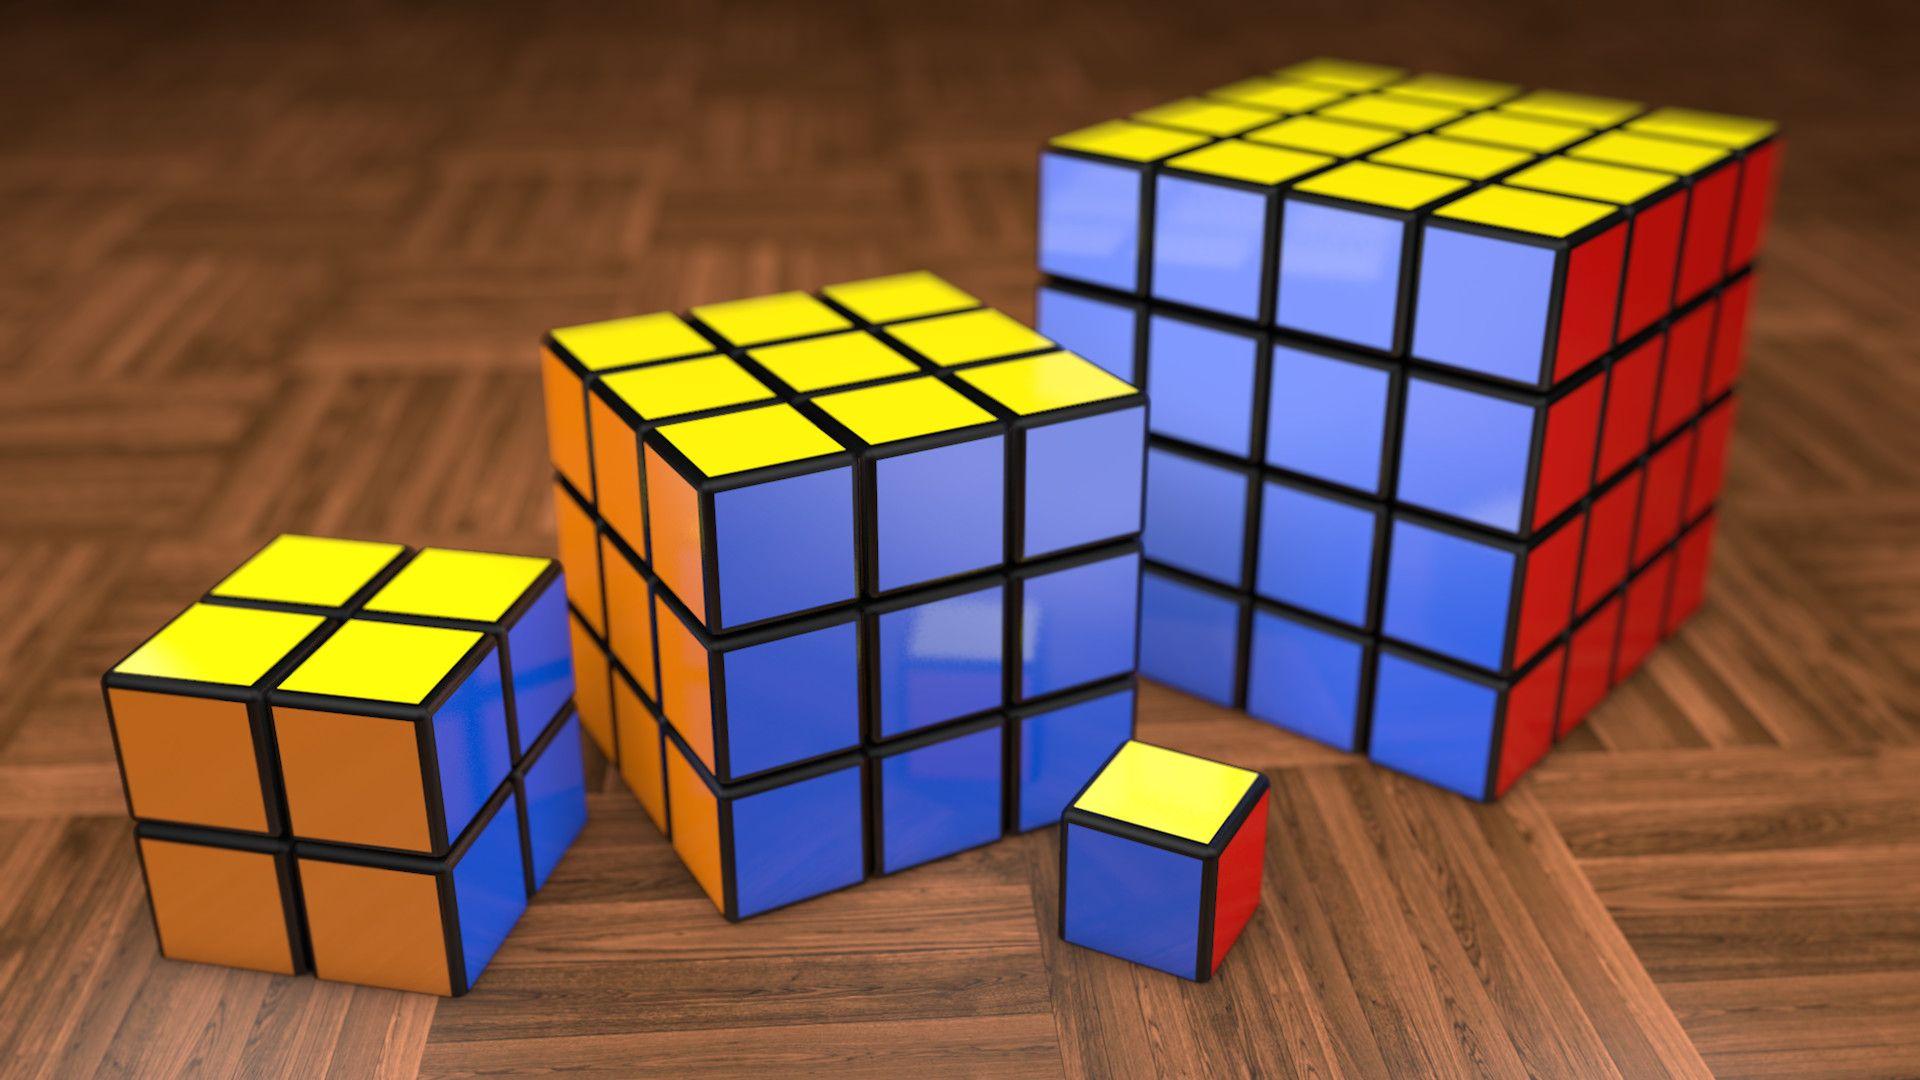 Rubiks Cube PC Wallpaper HD